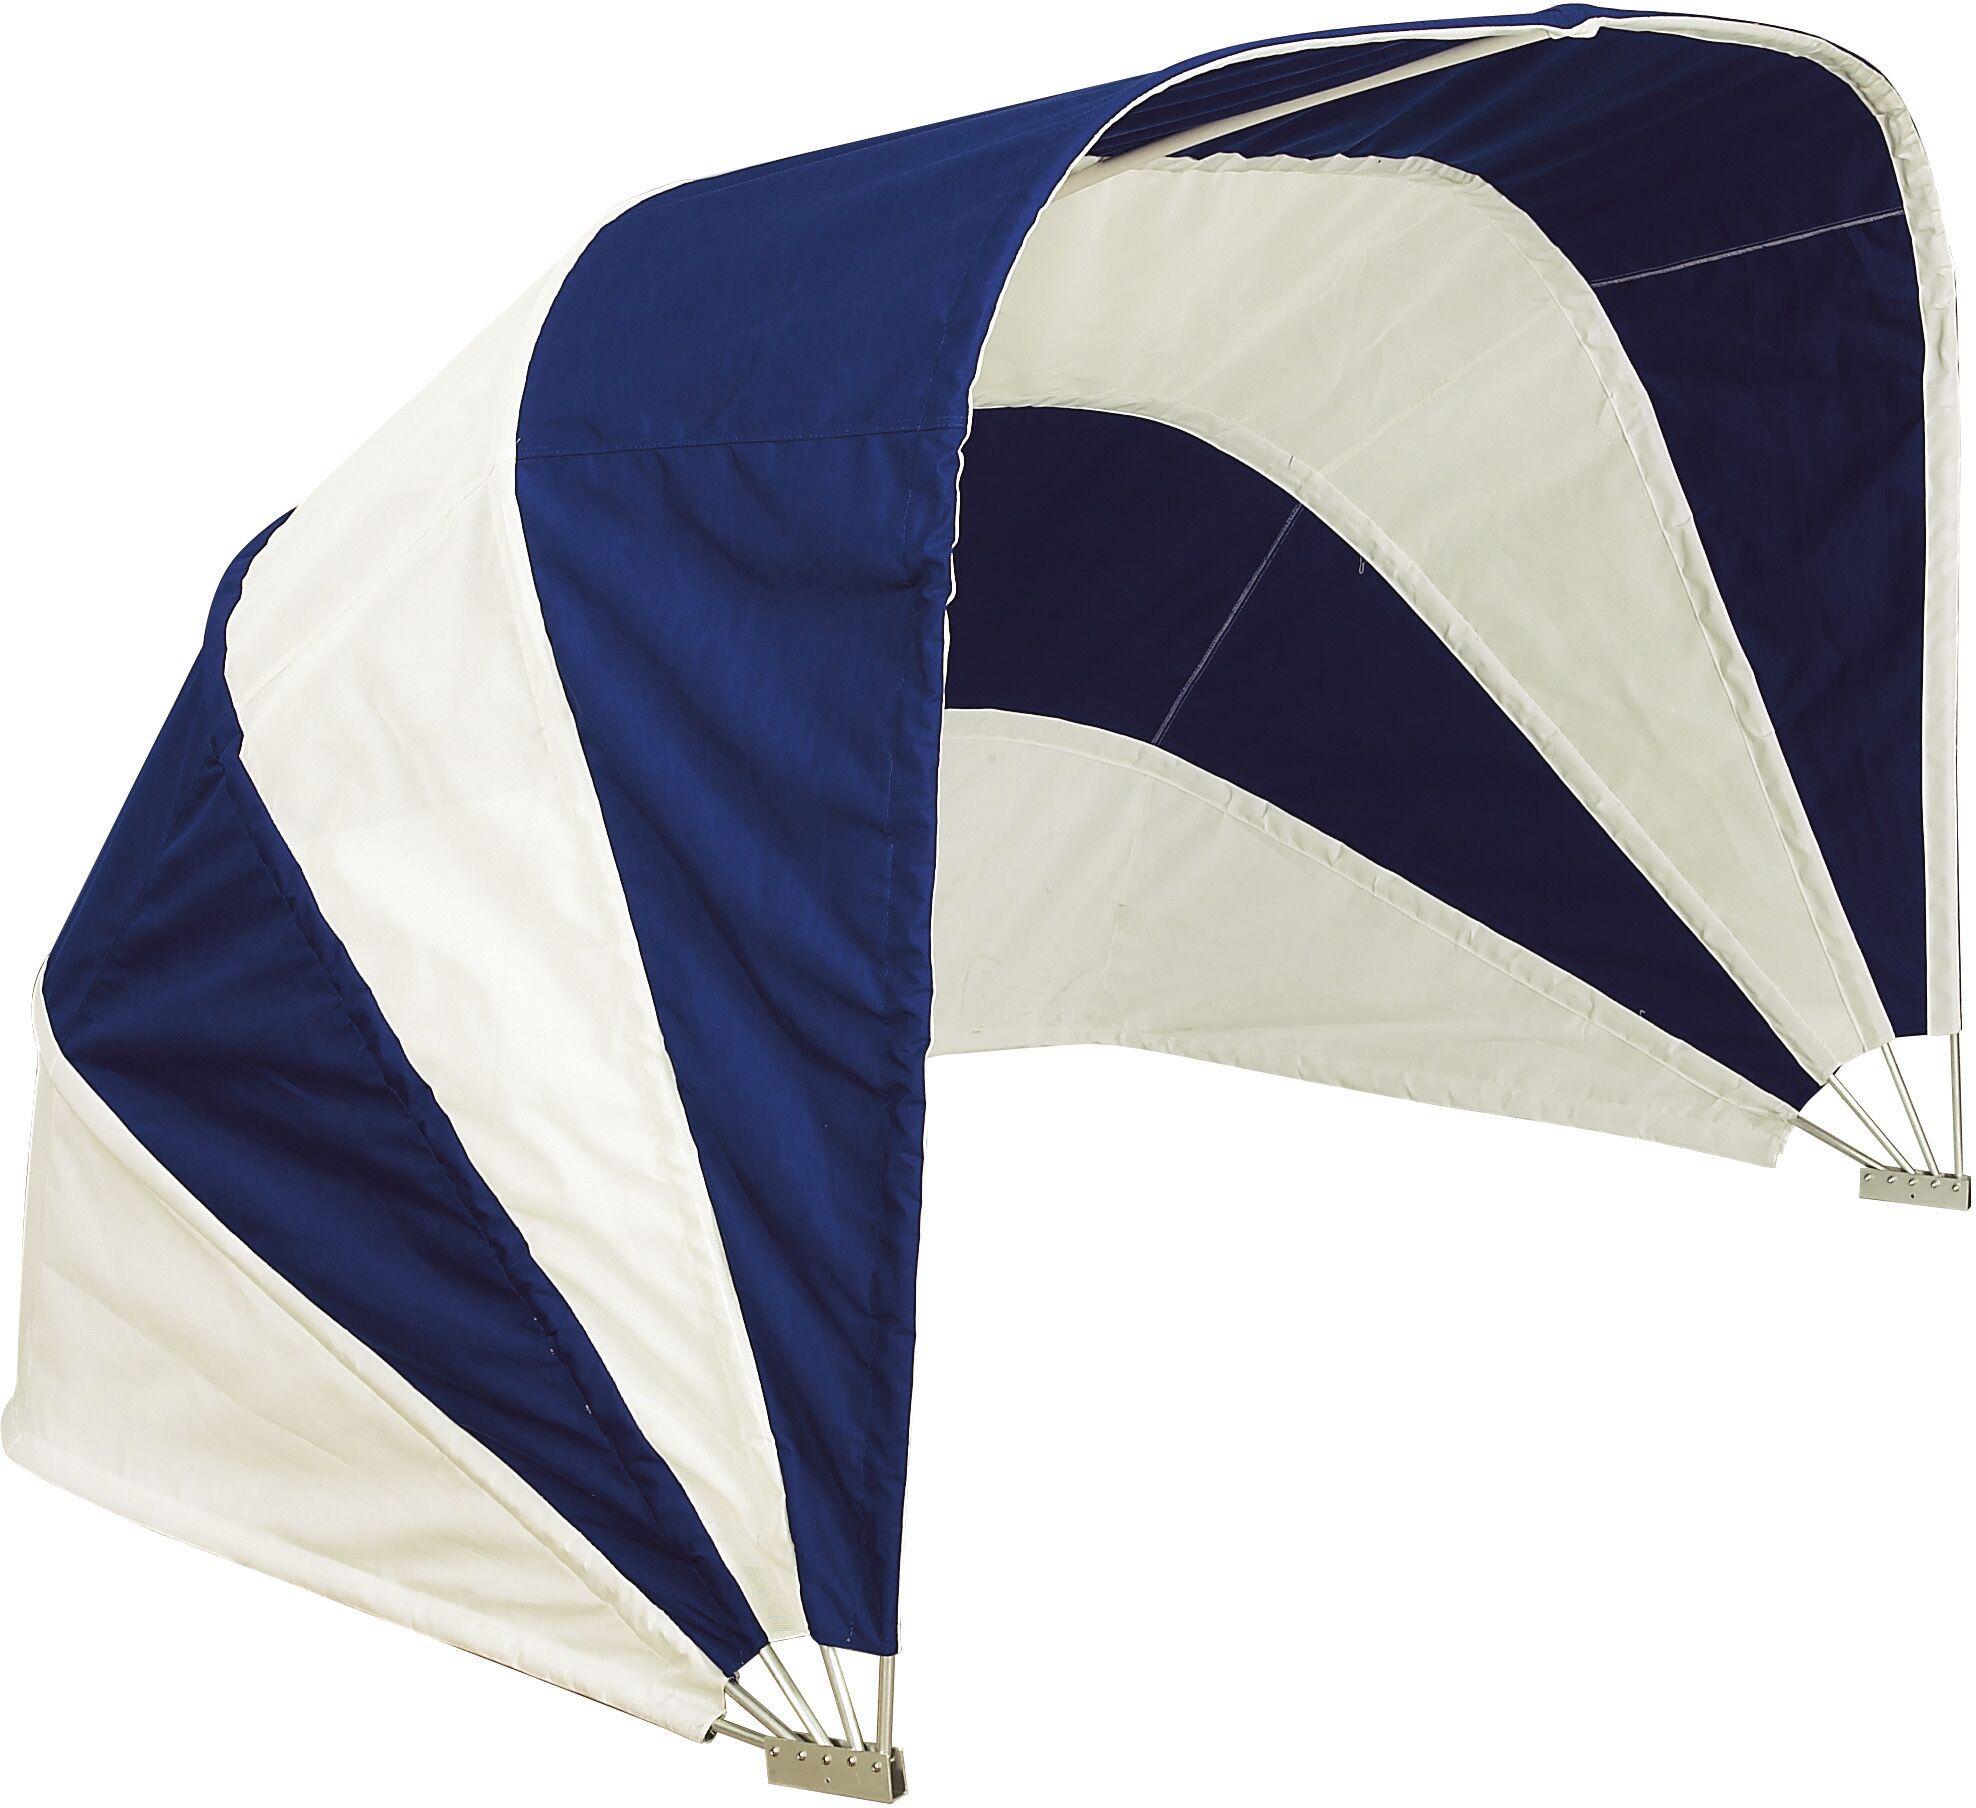 Prestige Cabana 2 Person Tent Fabric: Tan